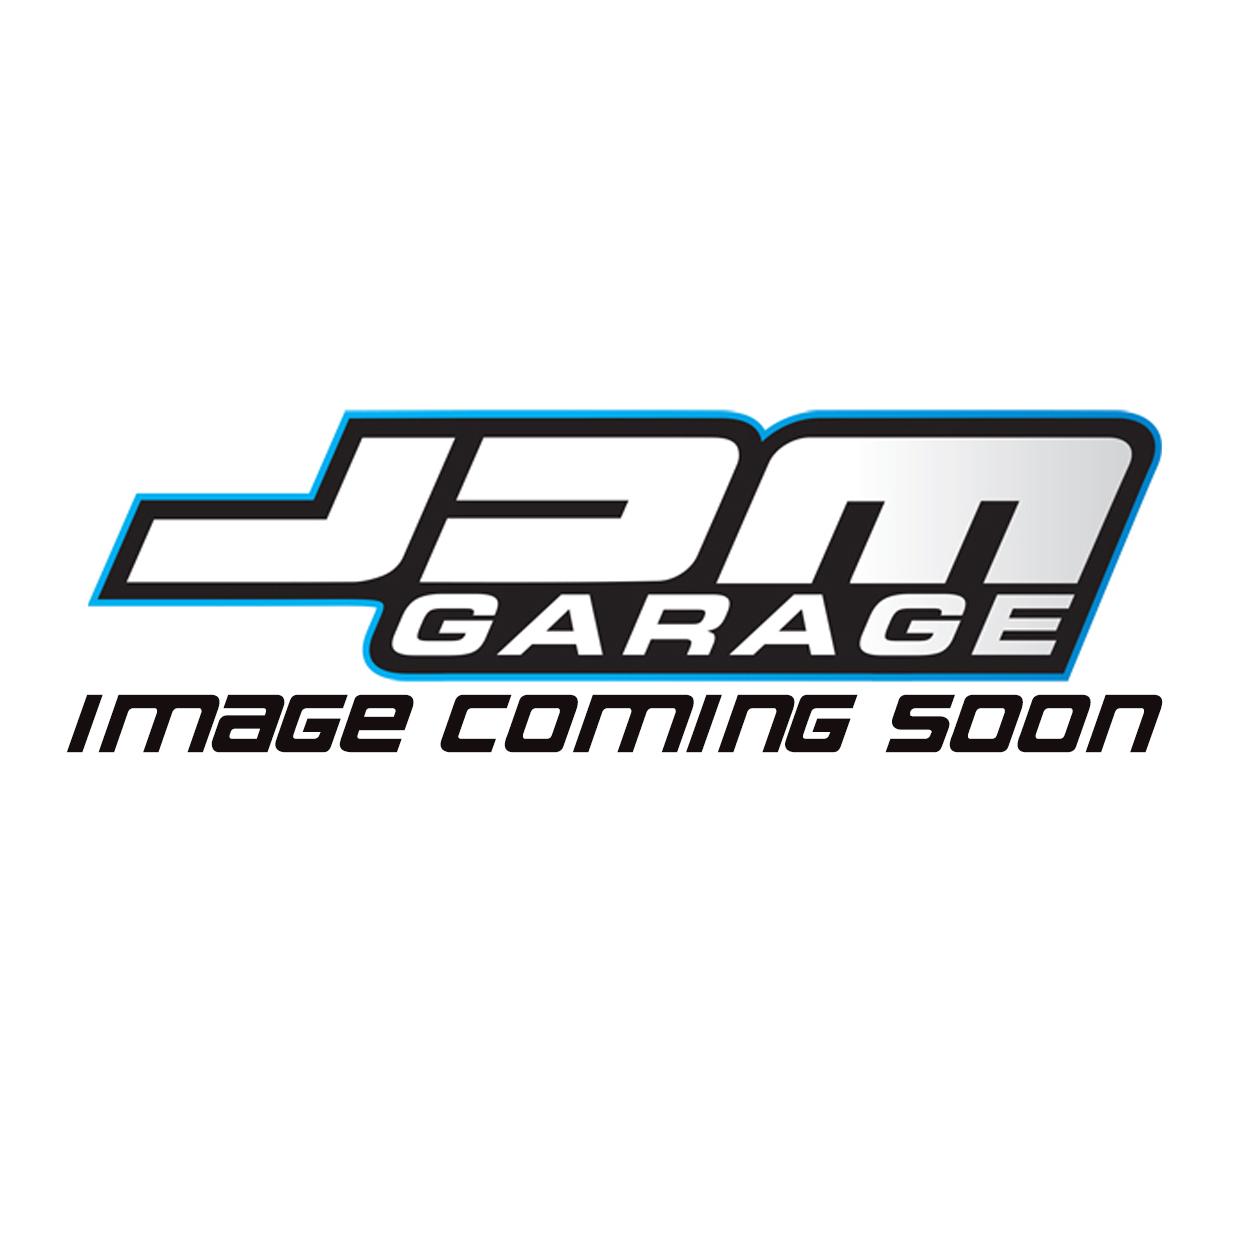 Exedy Clutch Kit Organic / Sport / Race / Hyper Single / Twin / Triple For Evo II / III / IV / V / VI / VII / VIII / IX / X